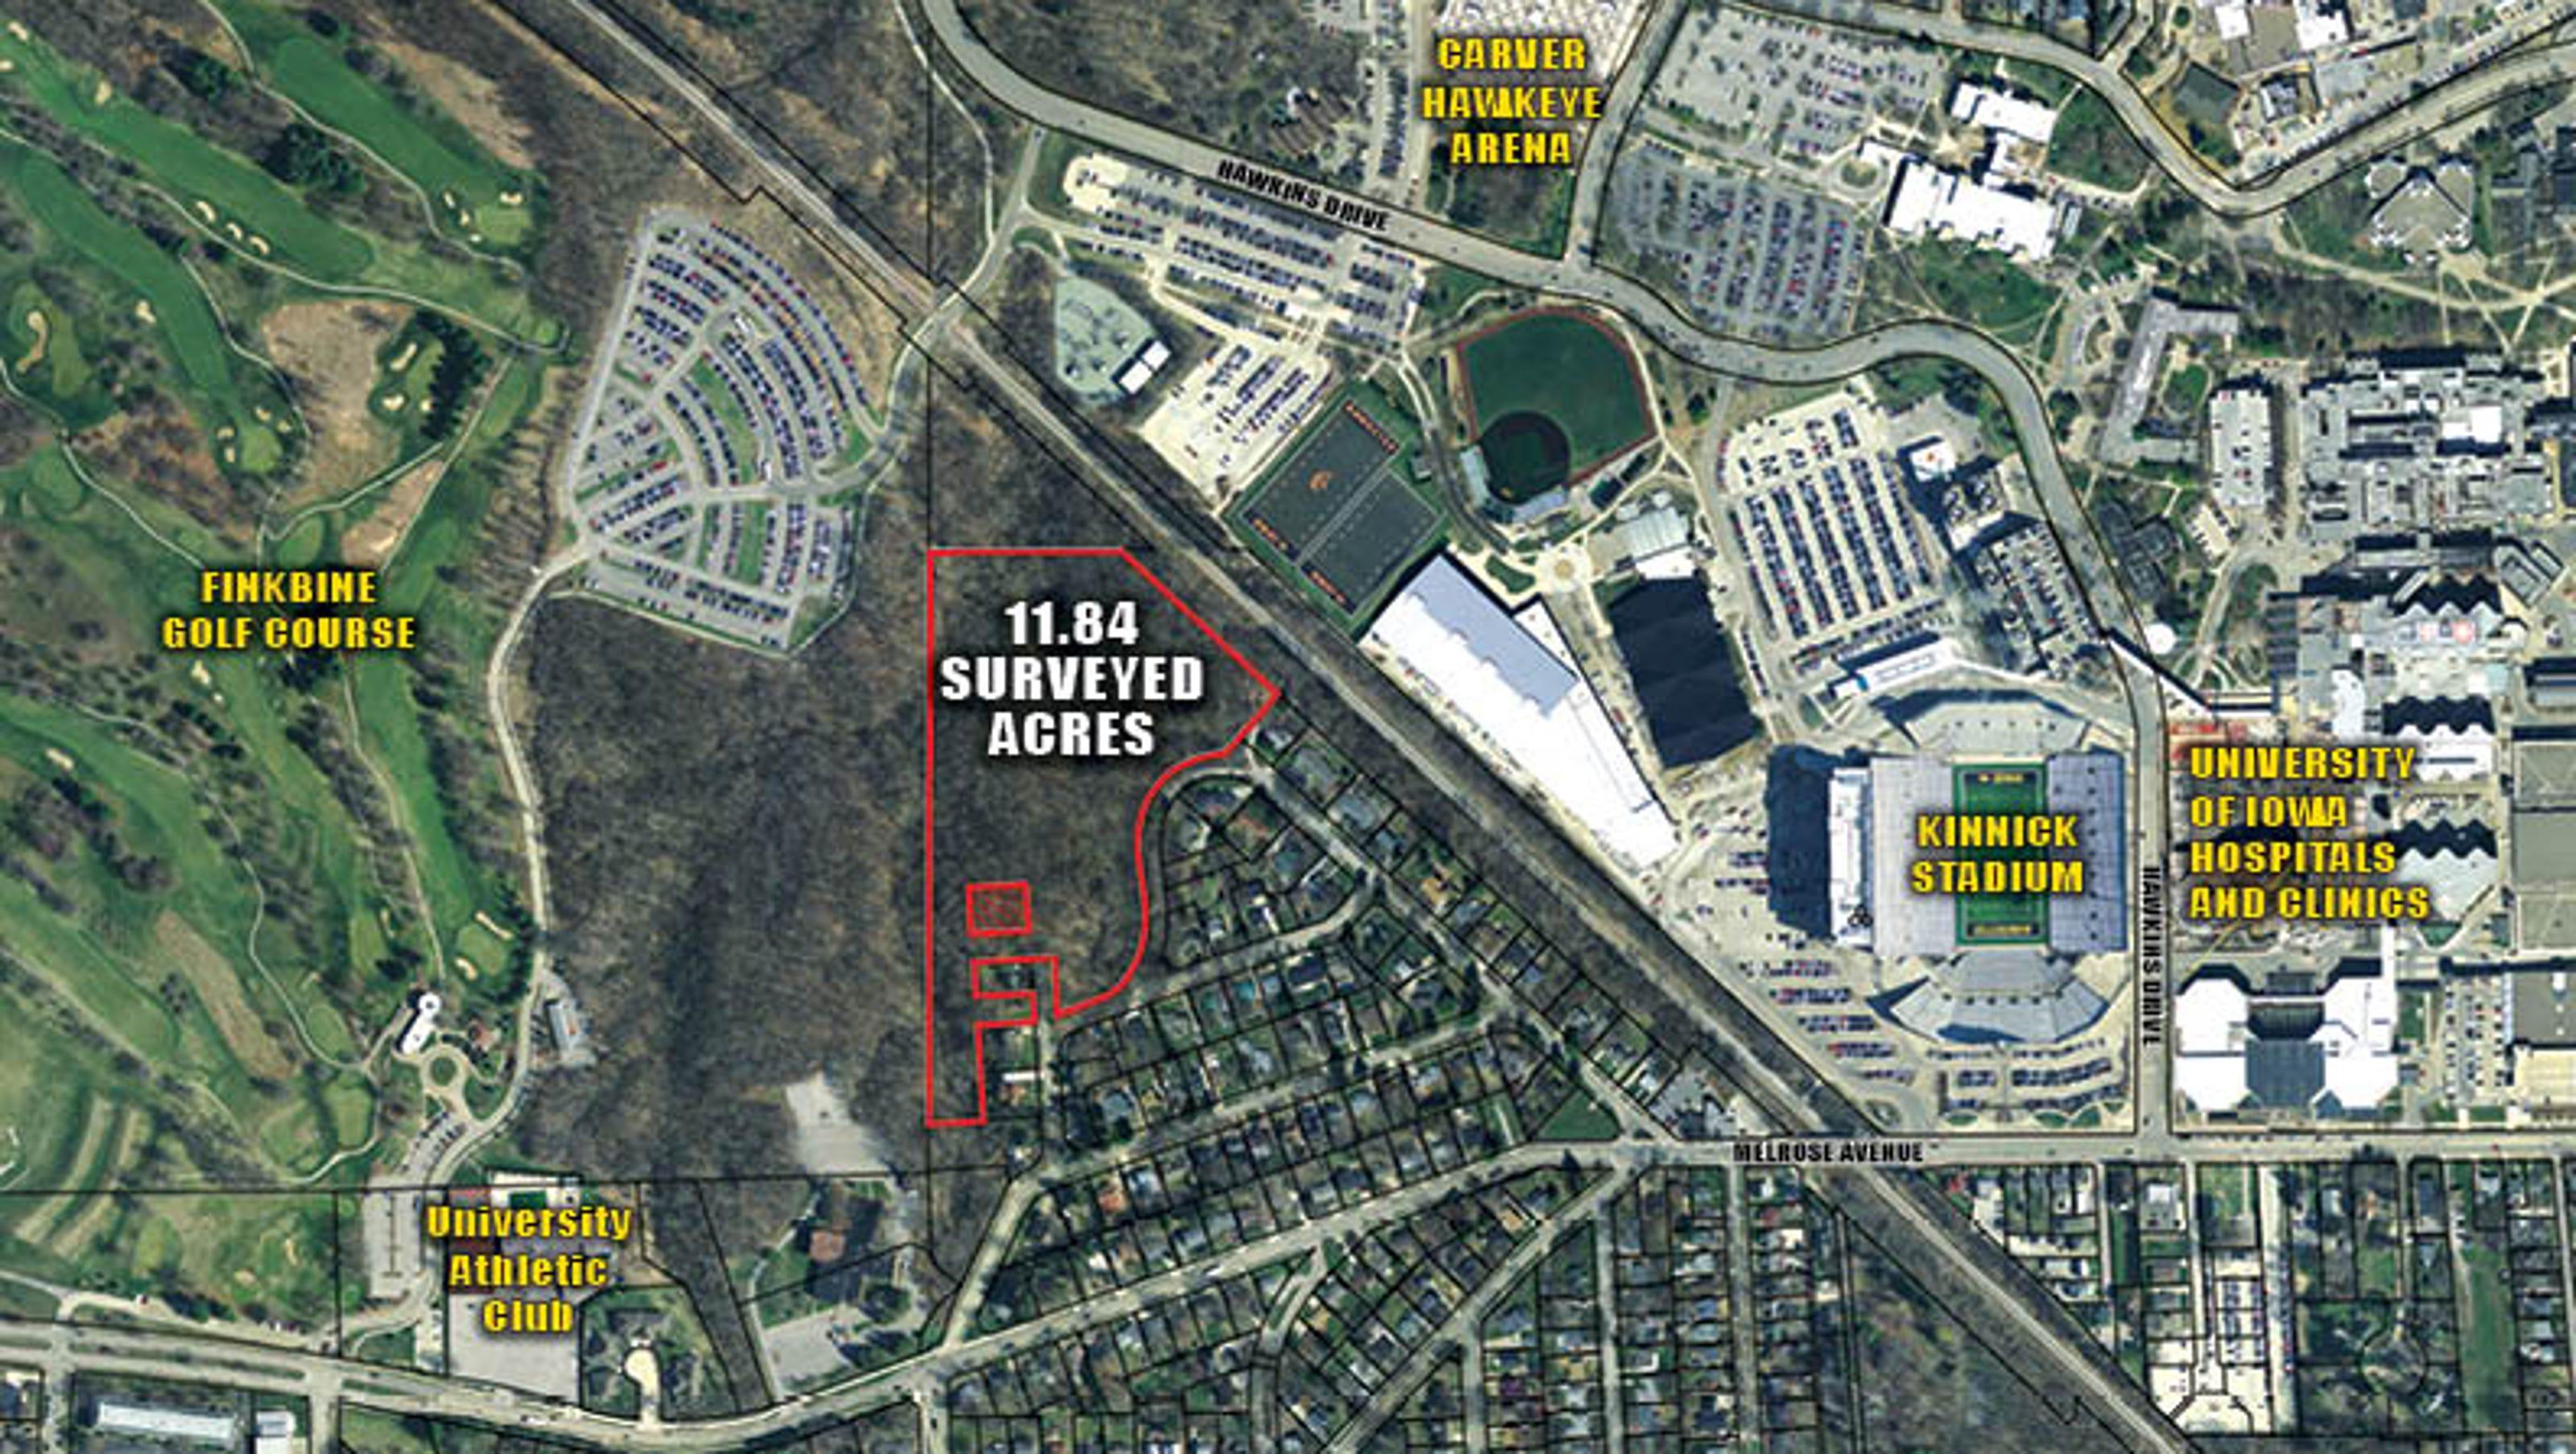 Kinnick Stadium Map University Heights wins auction for 11 acres near Kinnick Stadium Kinnick Stadium Map